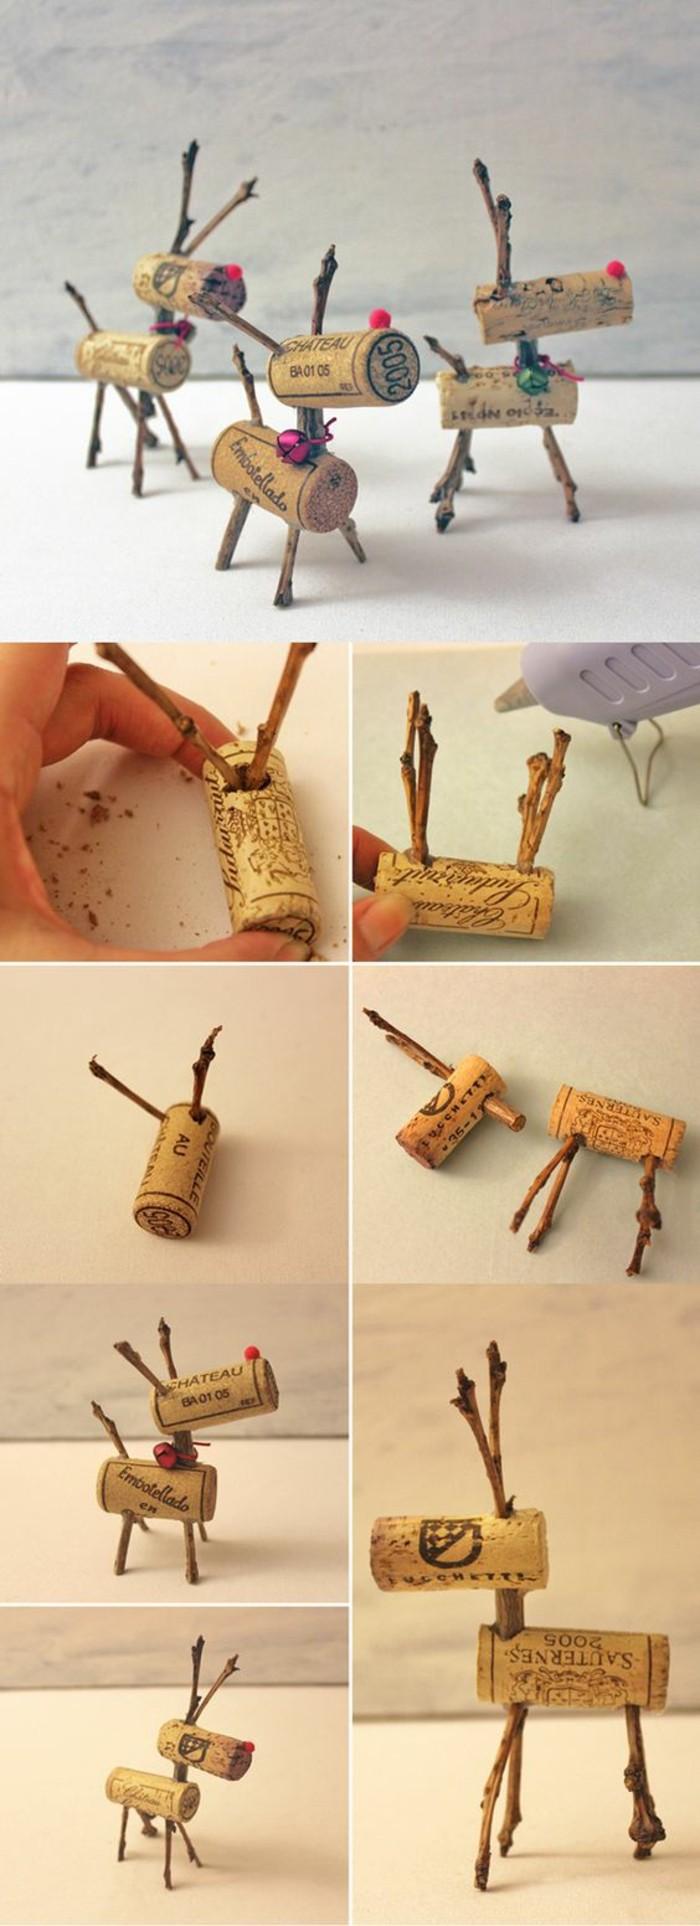 diy-ideas-with-corks40